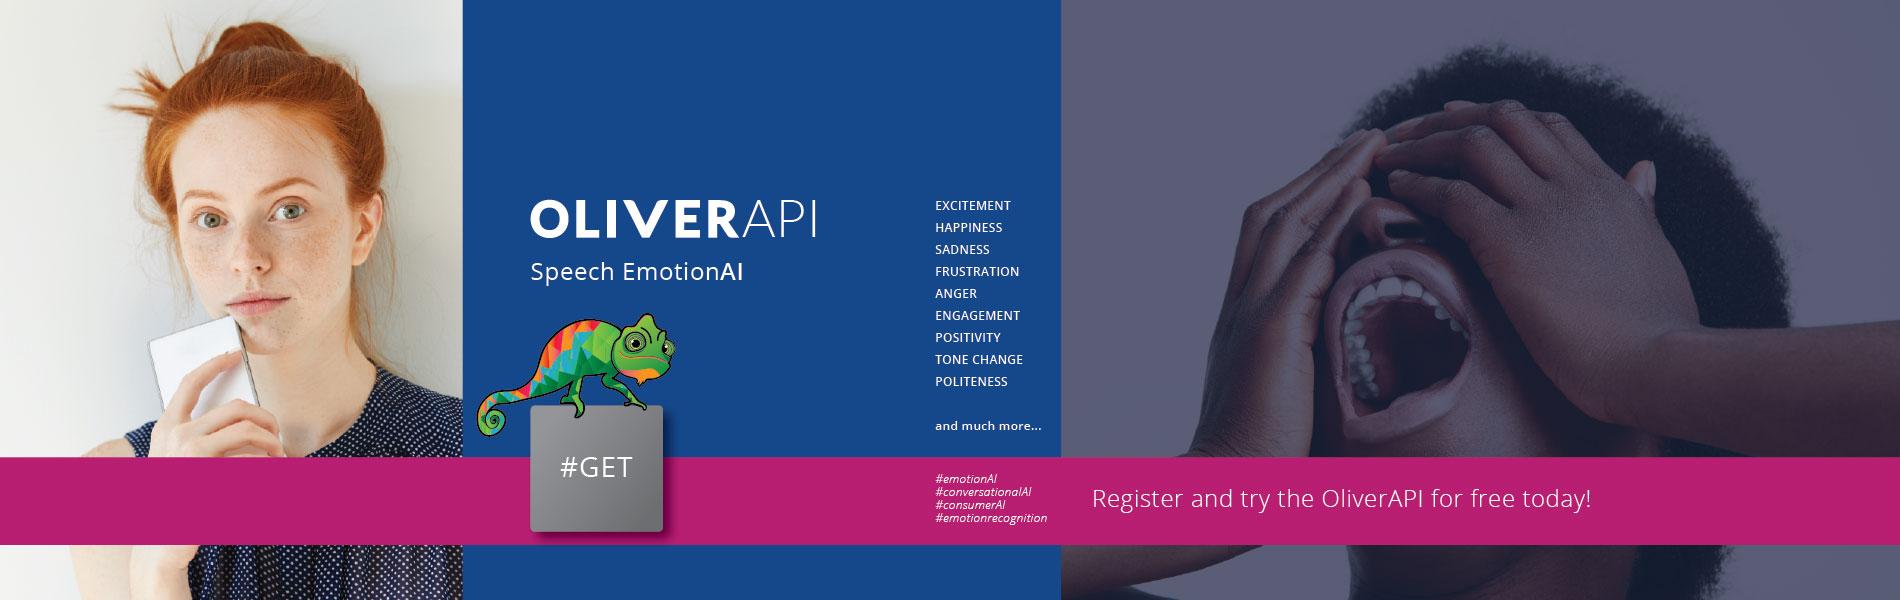 OliverAPI for speech emotionAI by Behavioral Signals